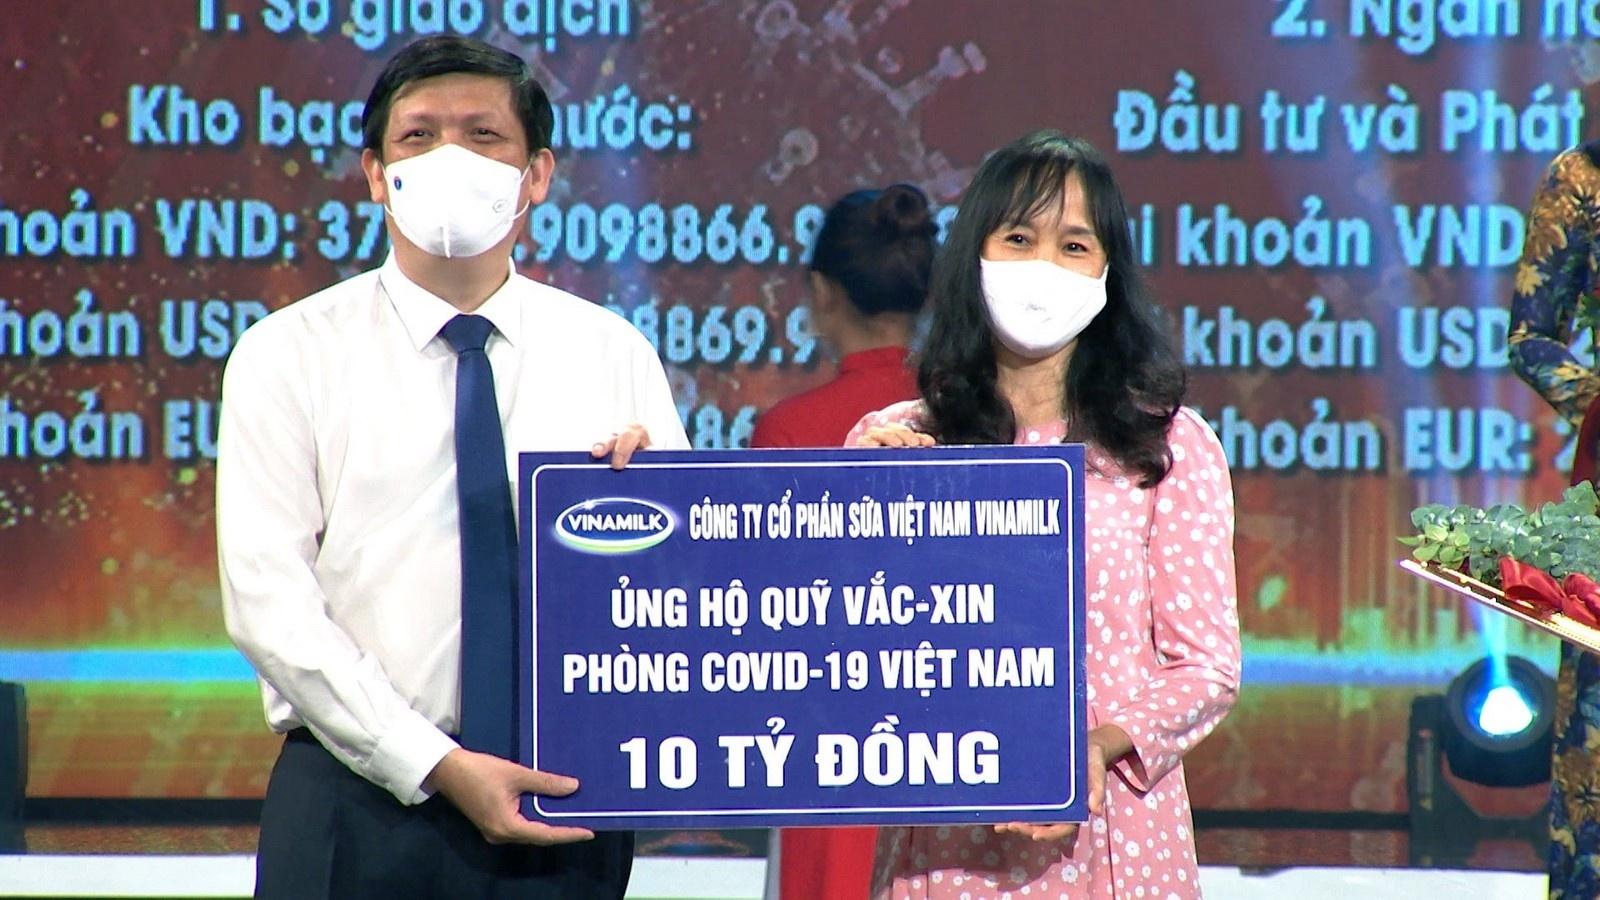 vinamilk chung tay cung chinh phu gop quy vaccine phong covid 19